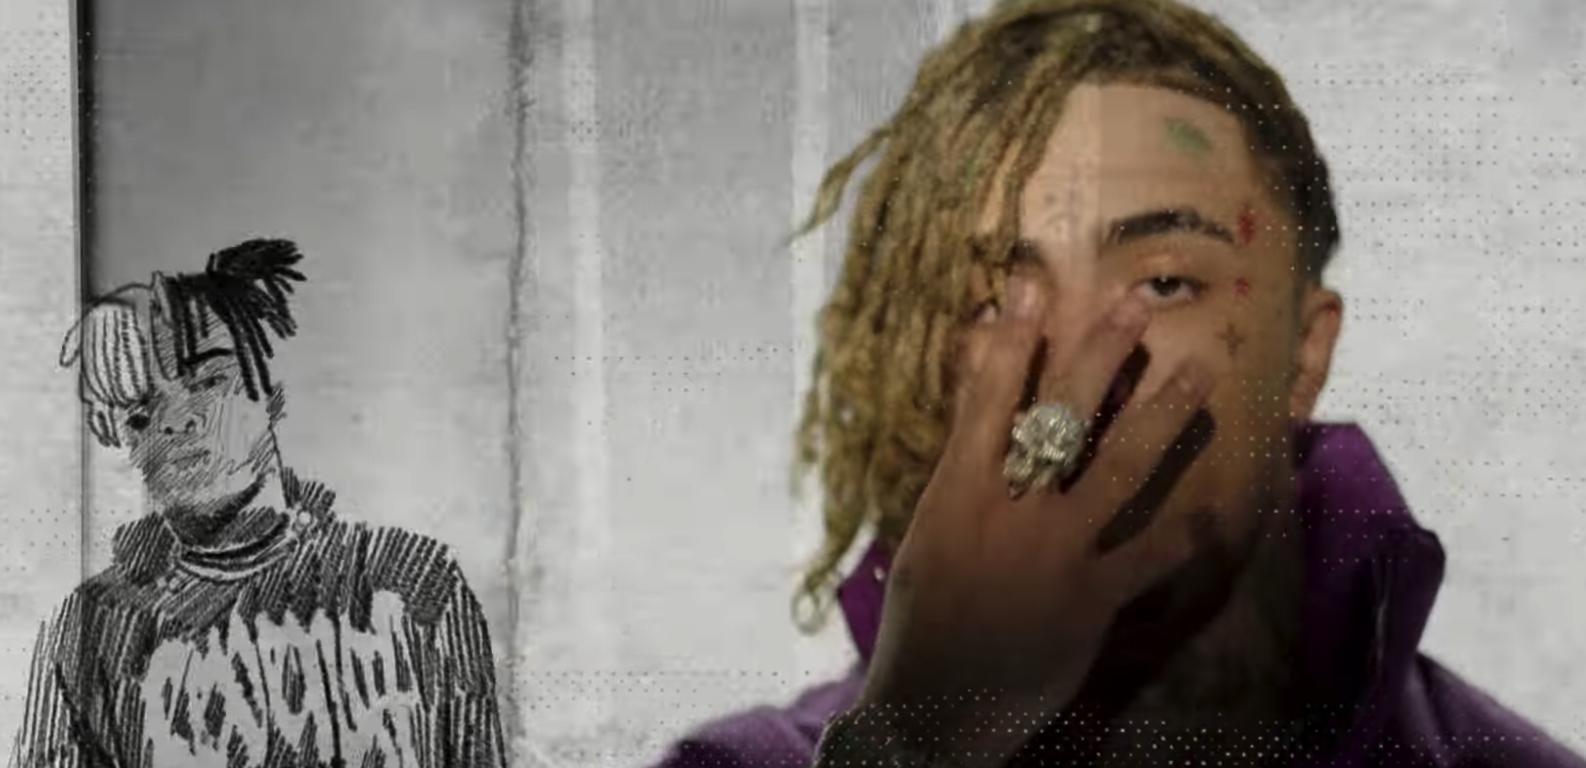 XXXTentacion & Lil Pump feat. Swae Lee & Maluma - Arms Around You